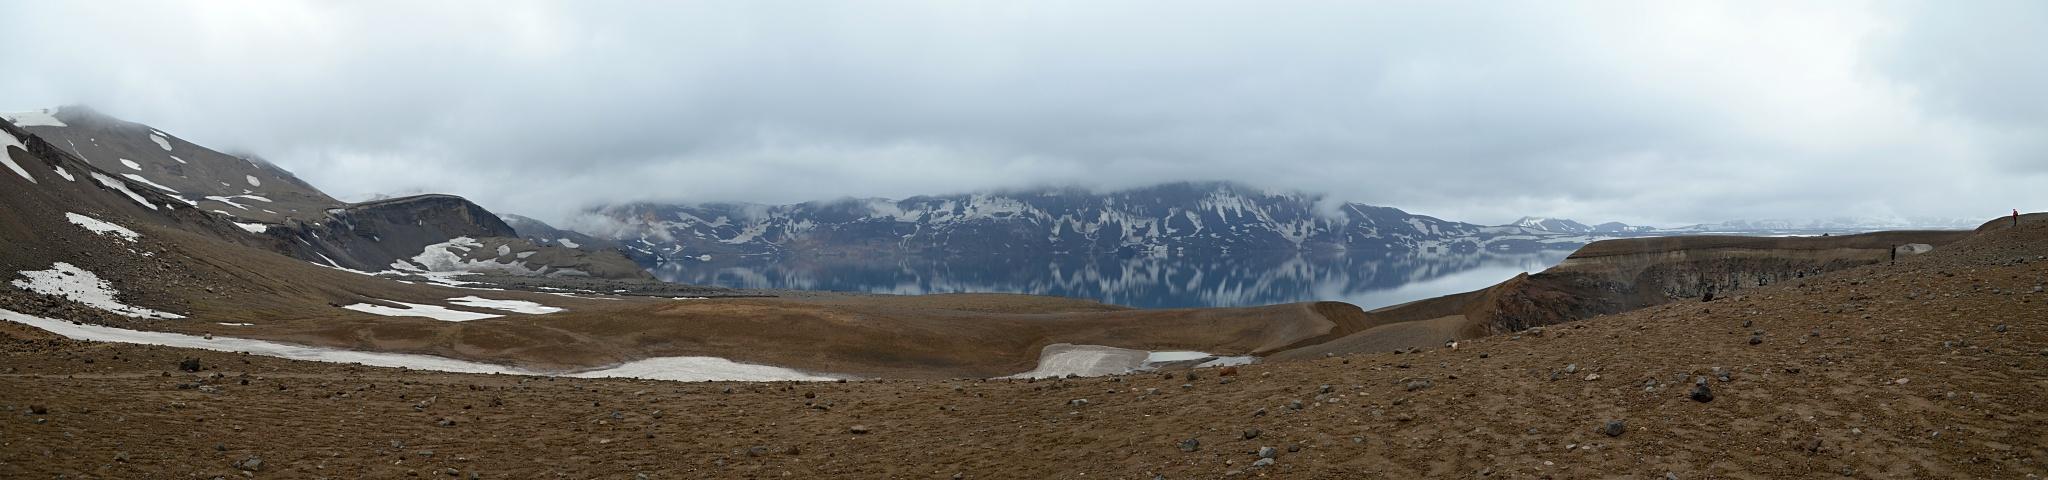 Panoramatická fotka kráteru a jezera Öskjuvatn